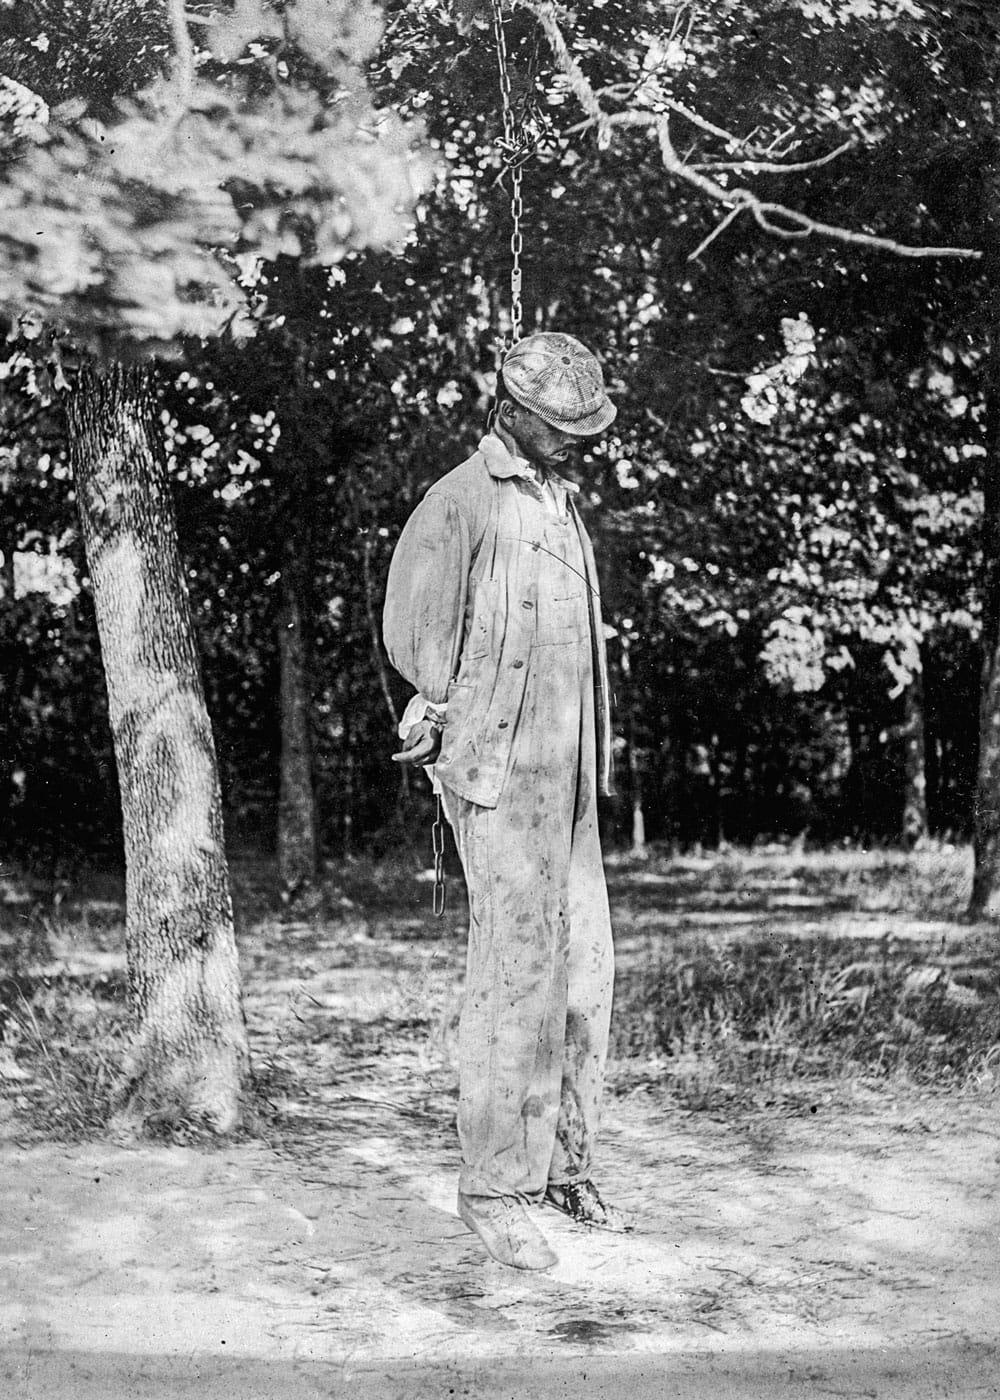 Lynching of a man in 1925